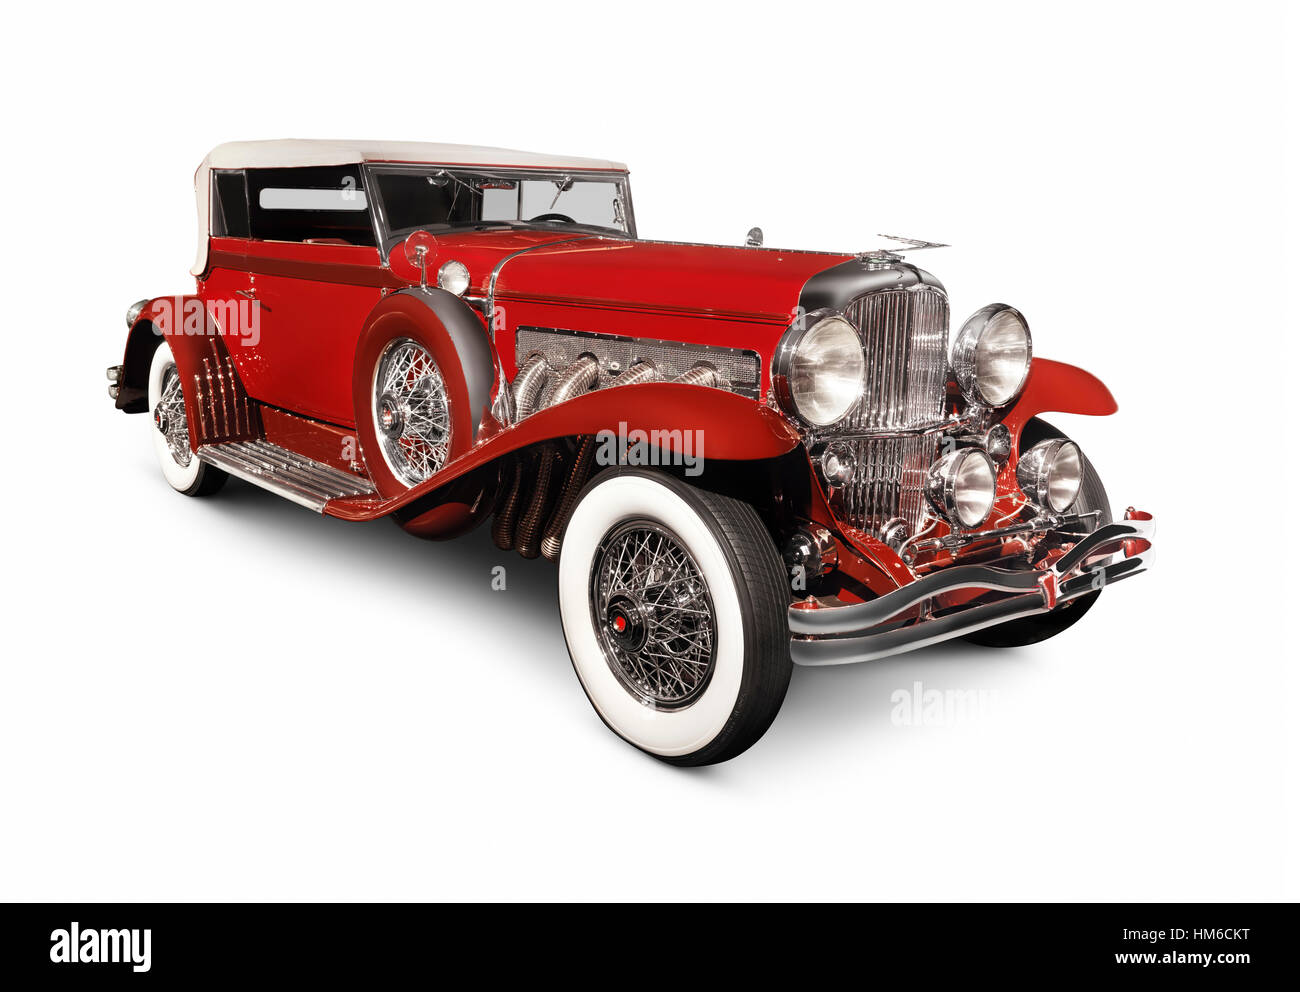 Red 1930 Duesenberg Model SJ, luxury classic vintage car - Stock Image